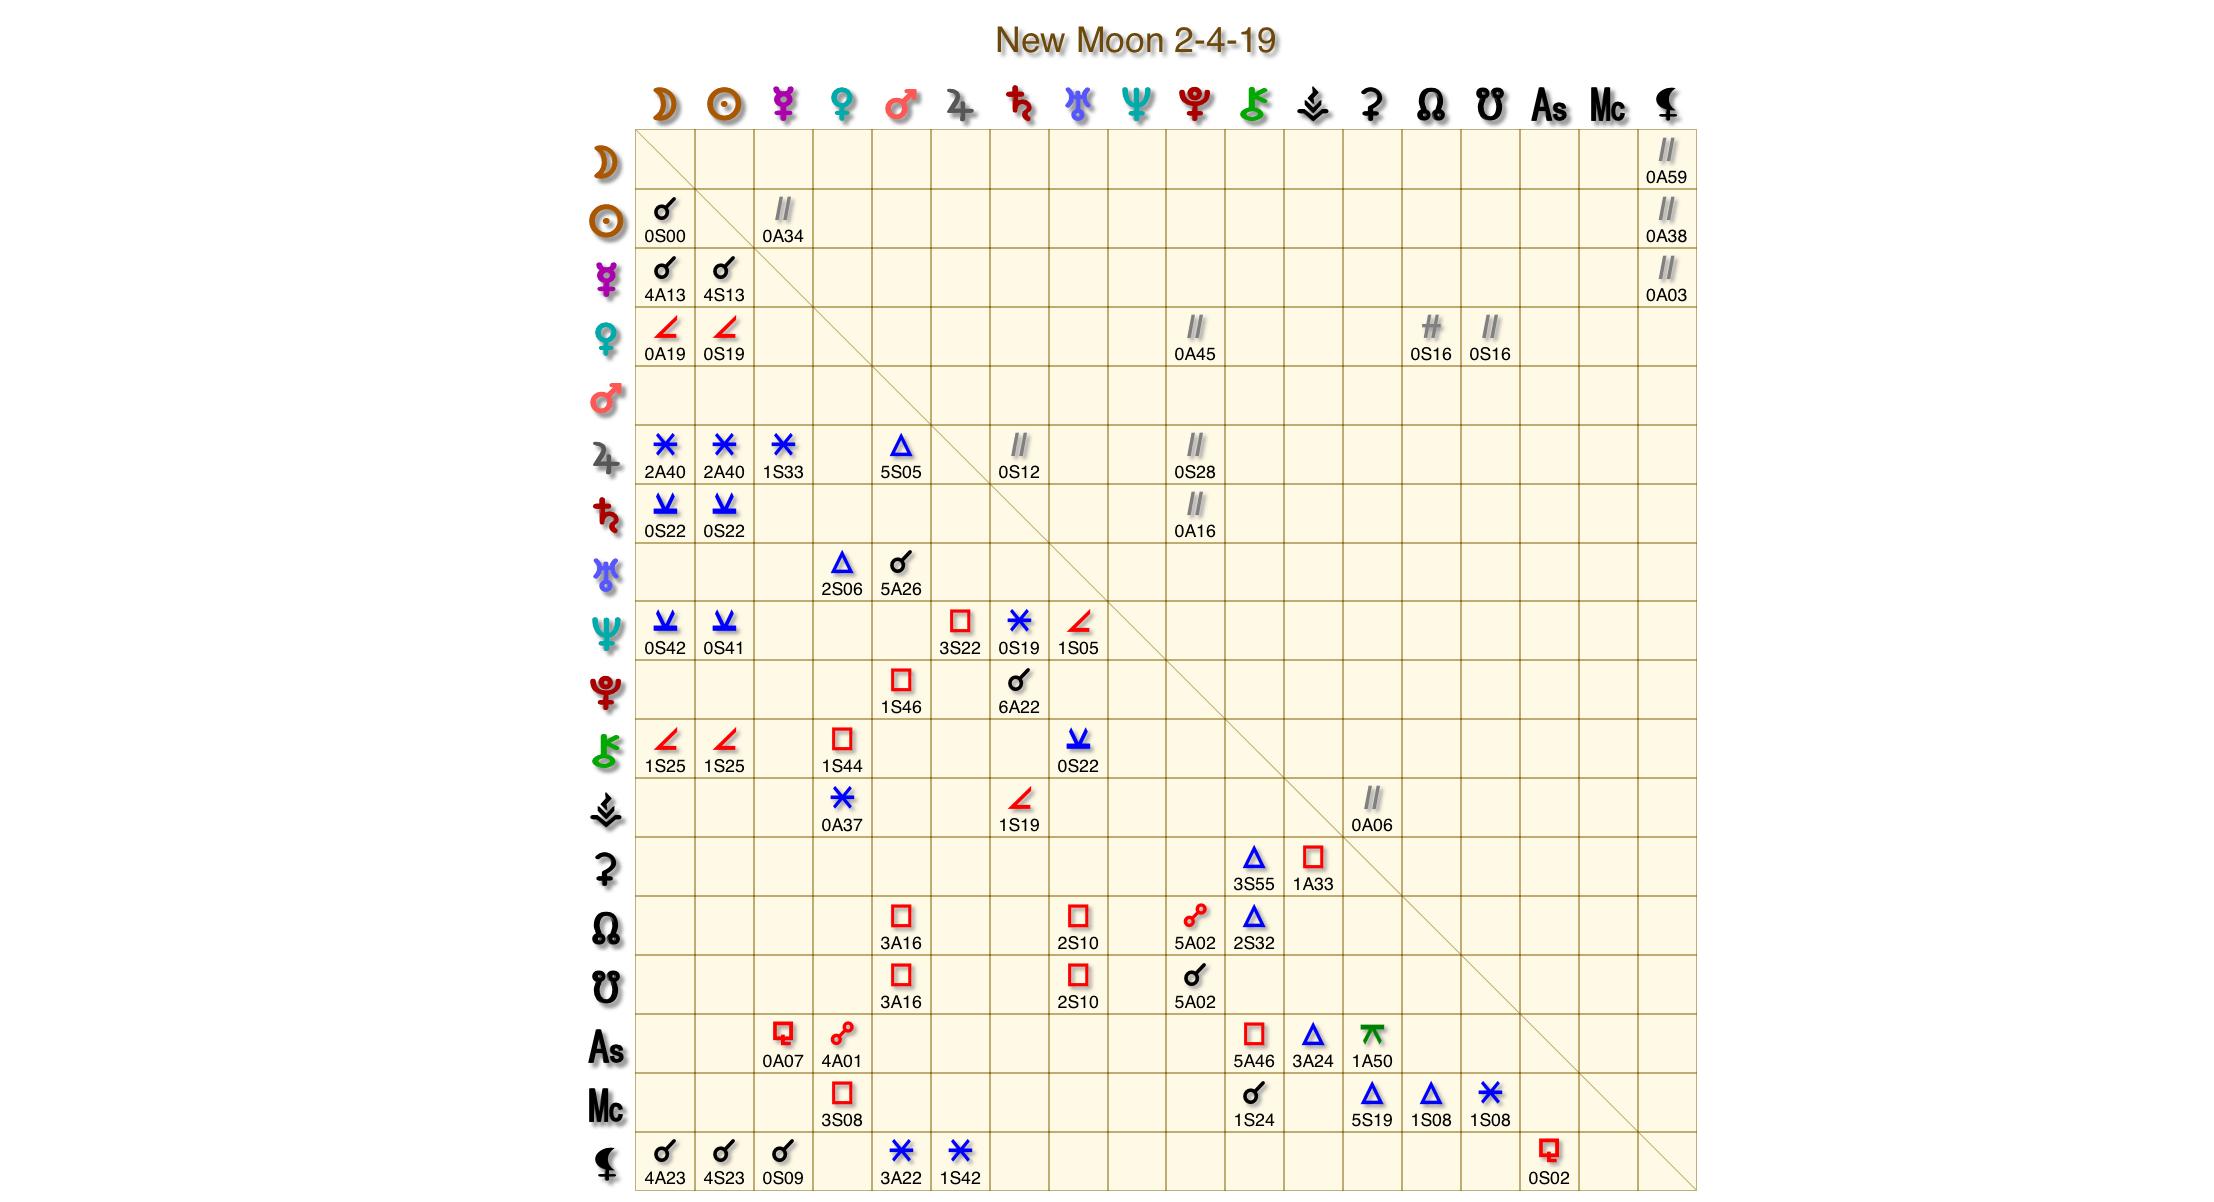 New Moon Grid